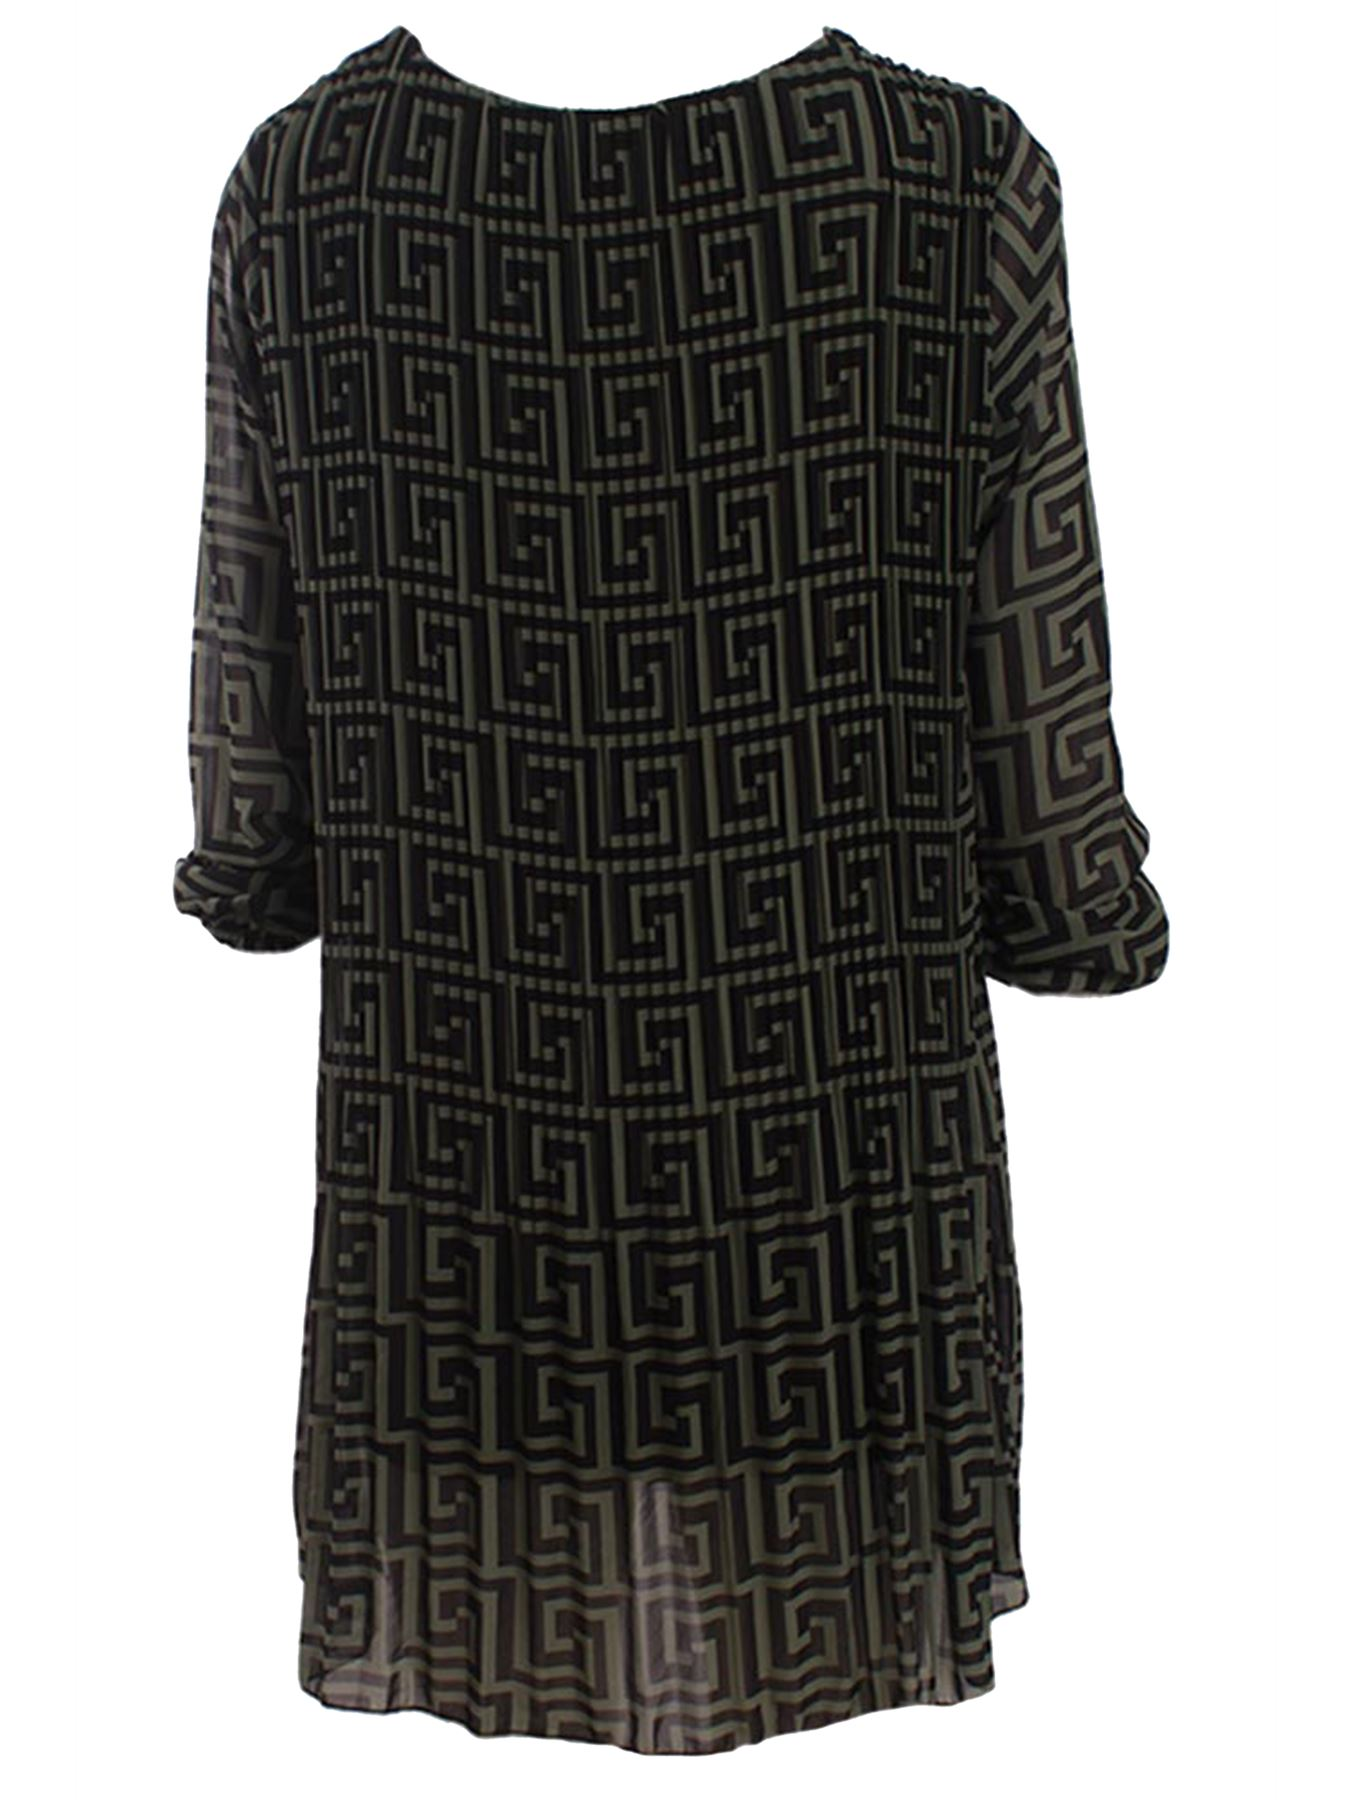 Womens Italian Lagenlook Tunic Top Baggy Loose Fit Cotton Summer Ladies Dress